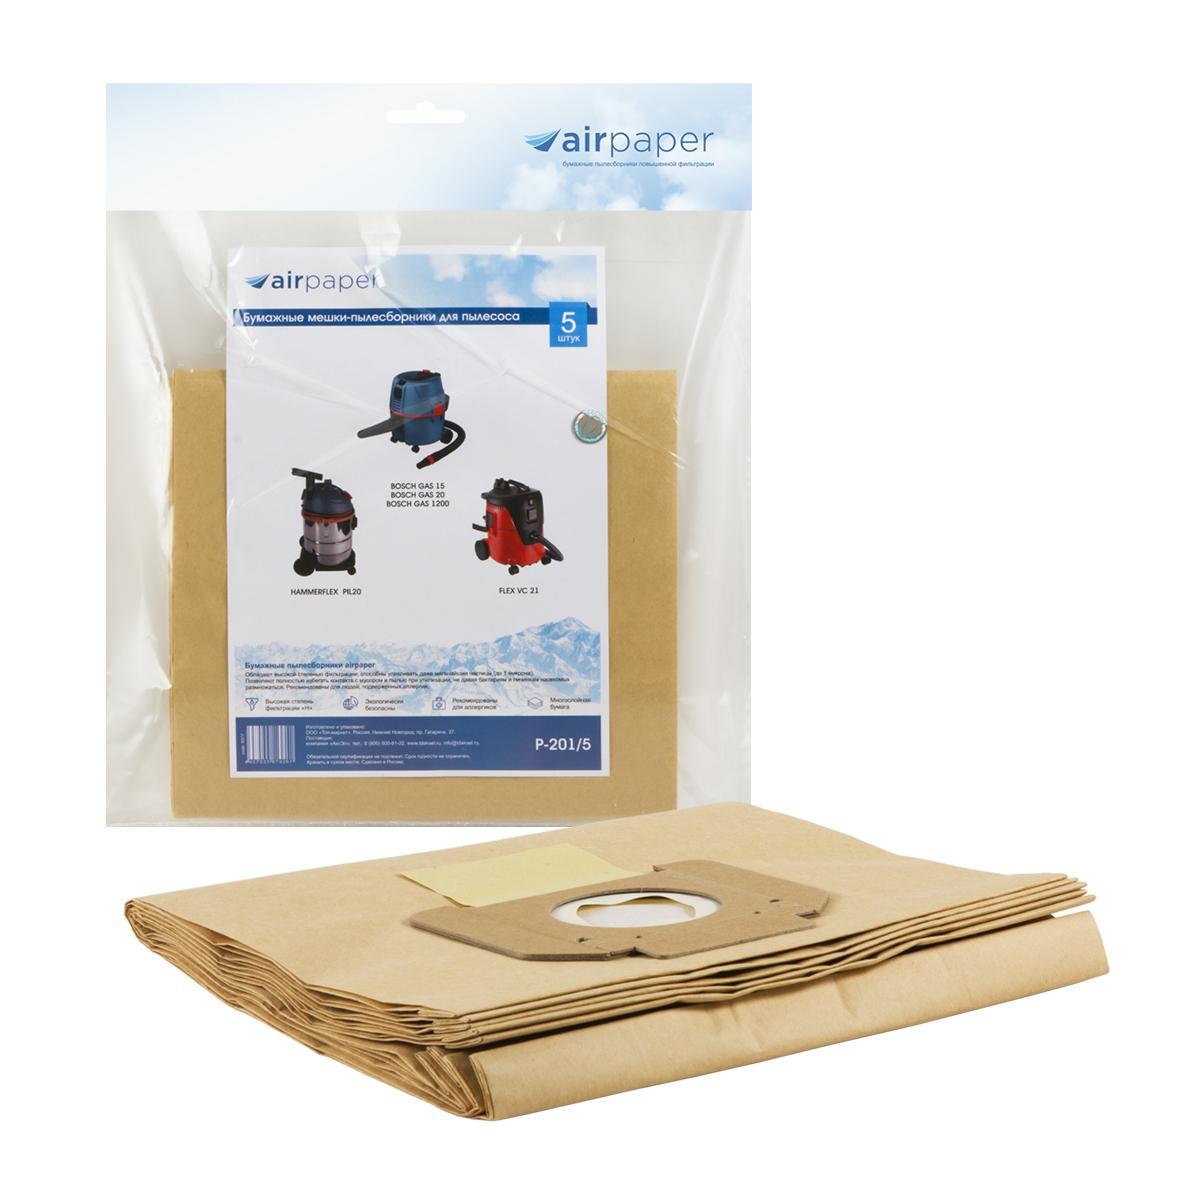 Мешок Air paper P-201/5  5 шт./уп. mikado fishunter 2 съедобная резина 7 5 см 313 уп 5 шт